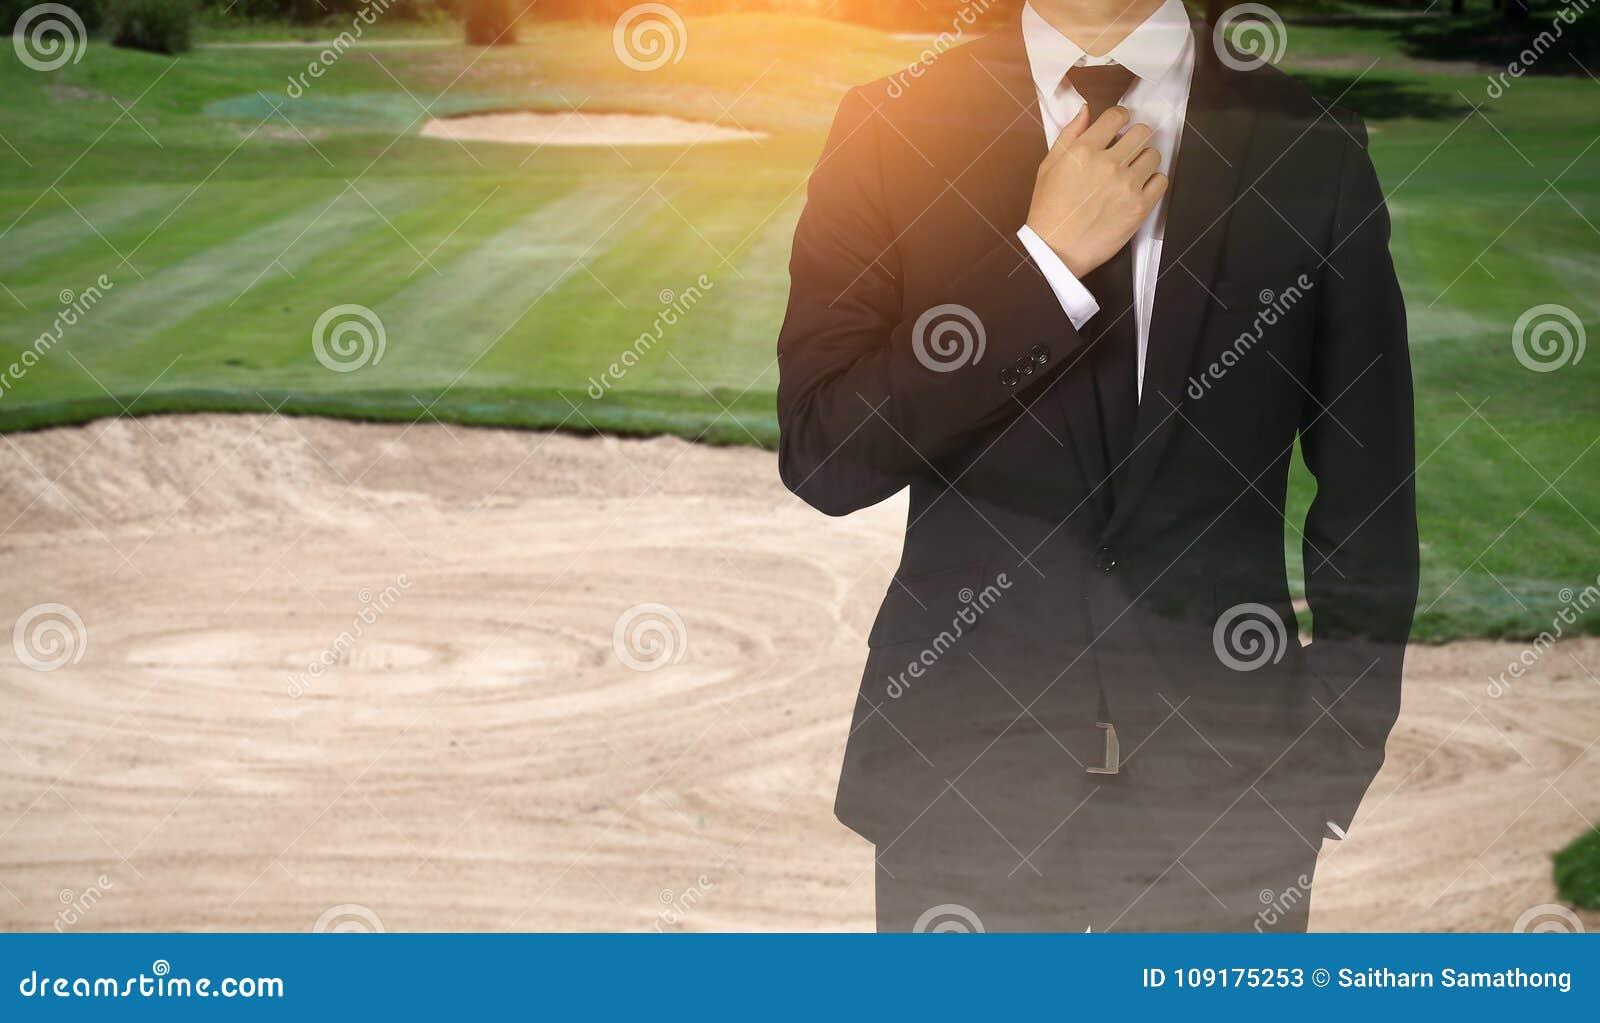 Businessman handles necktie showing confidence in golf course.